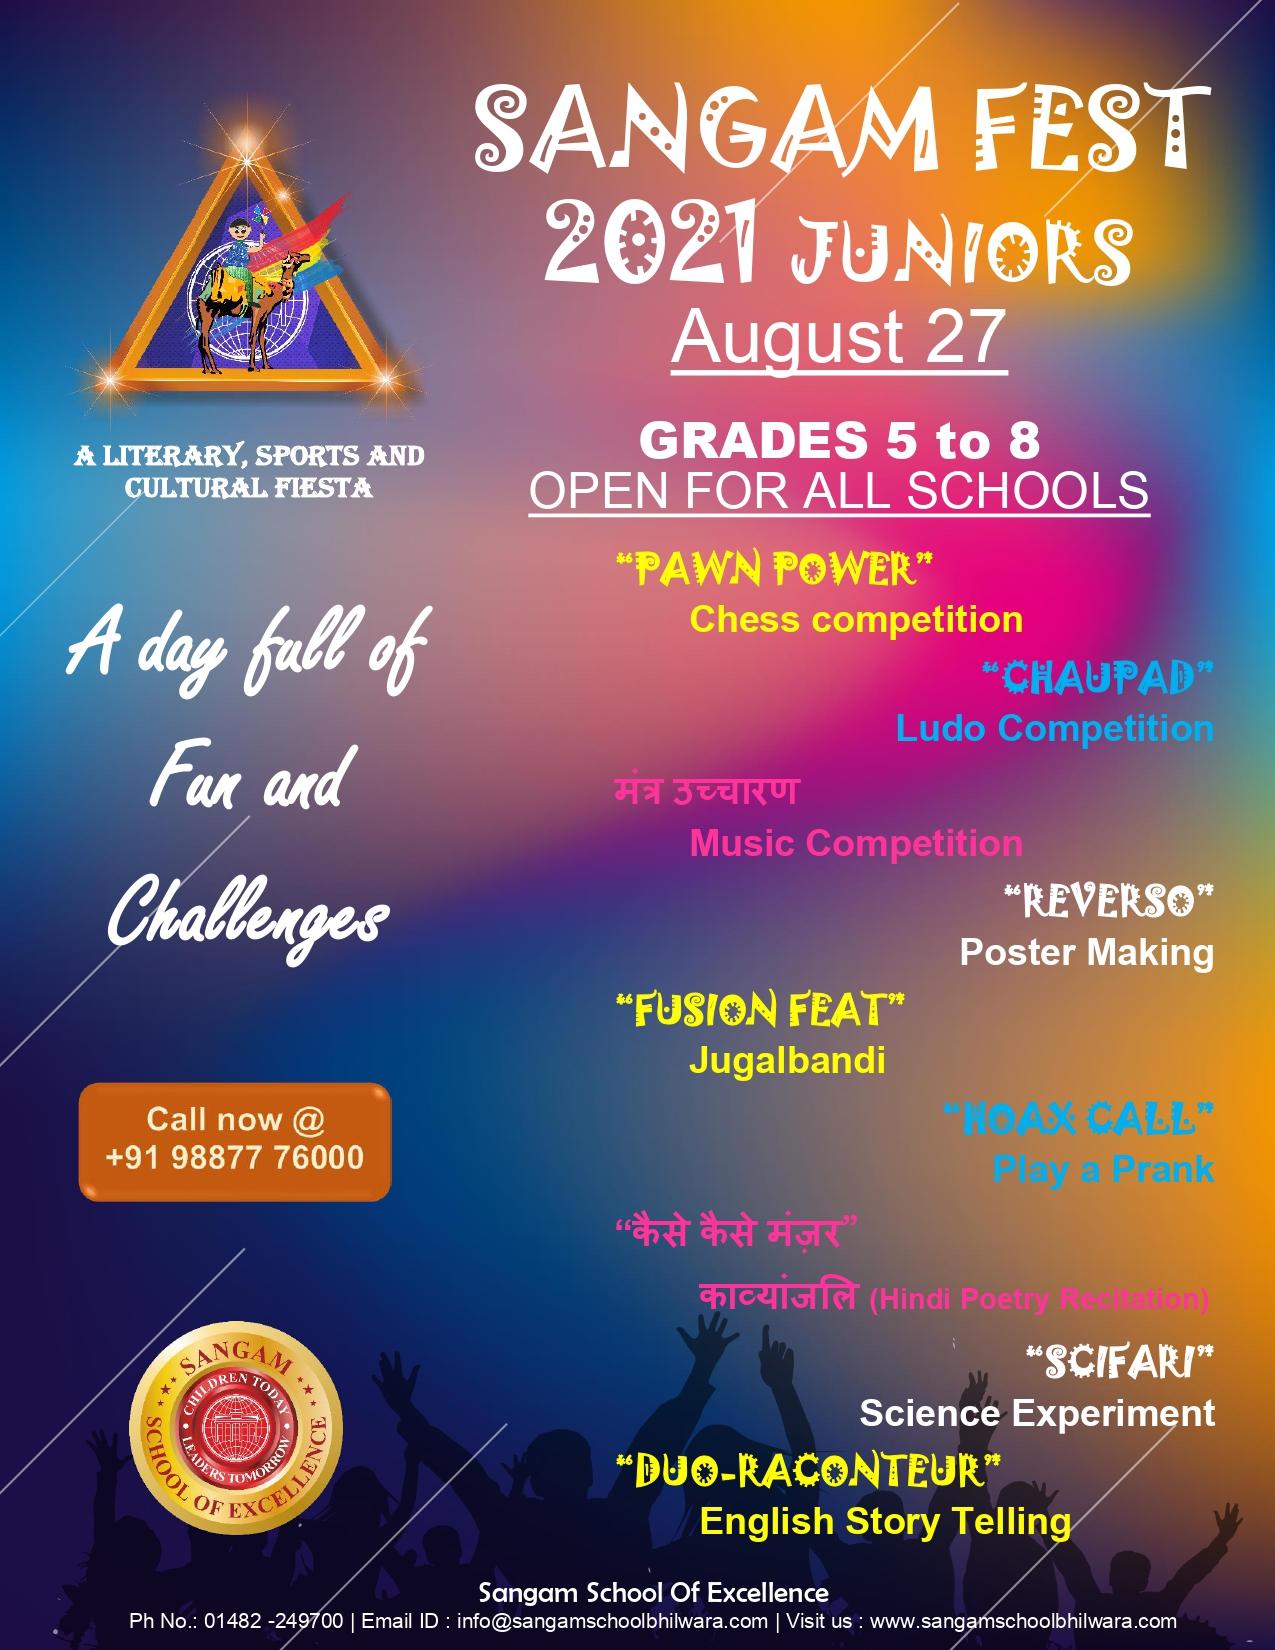 SANGAM FEST 2021 – JUNIORS – OPEN FOR ALL SCHOOLS